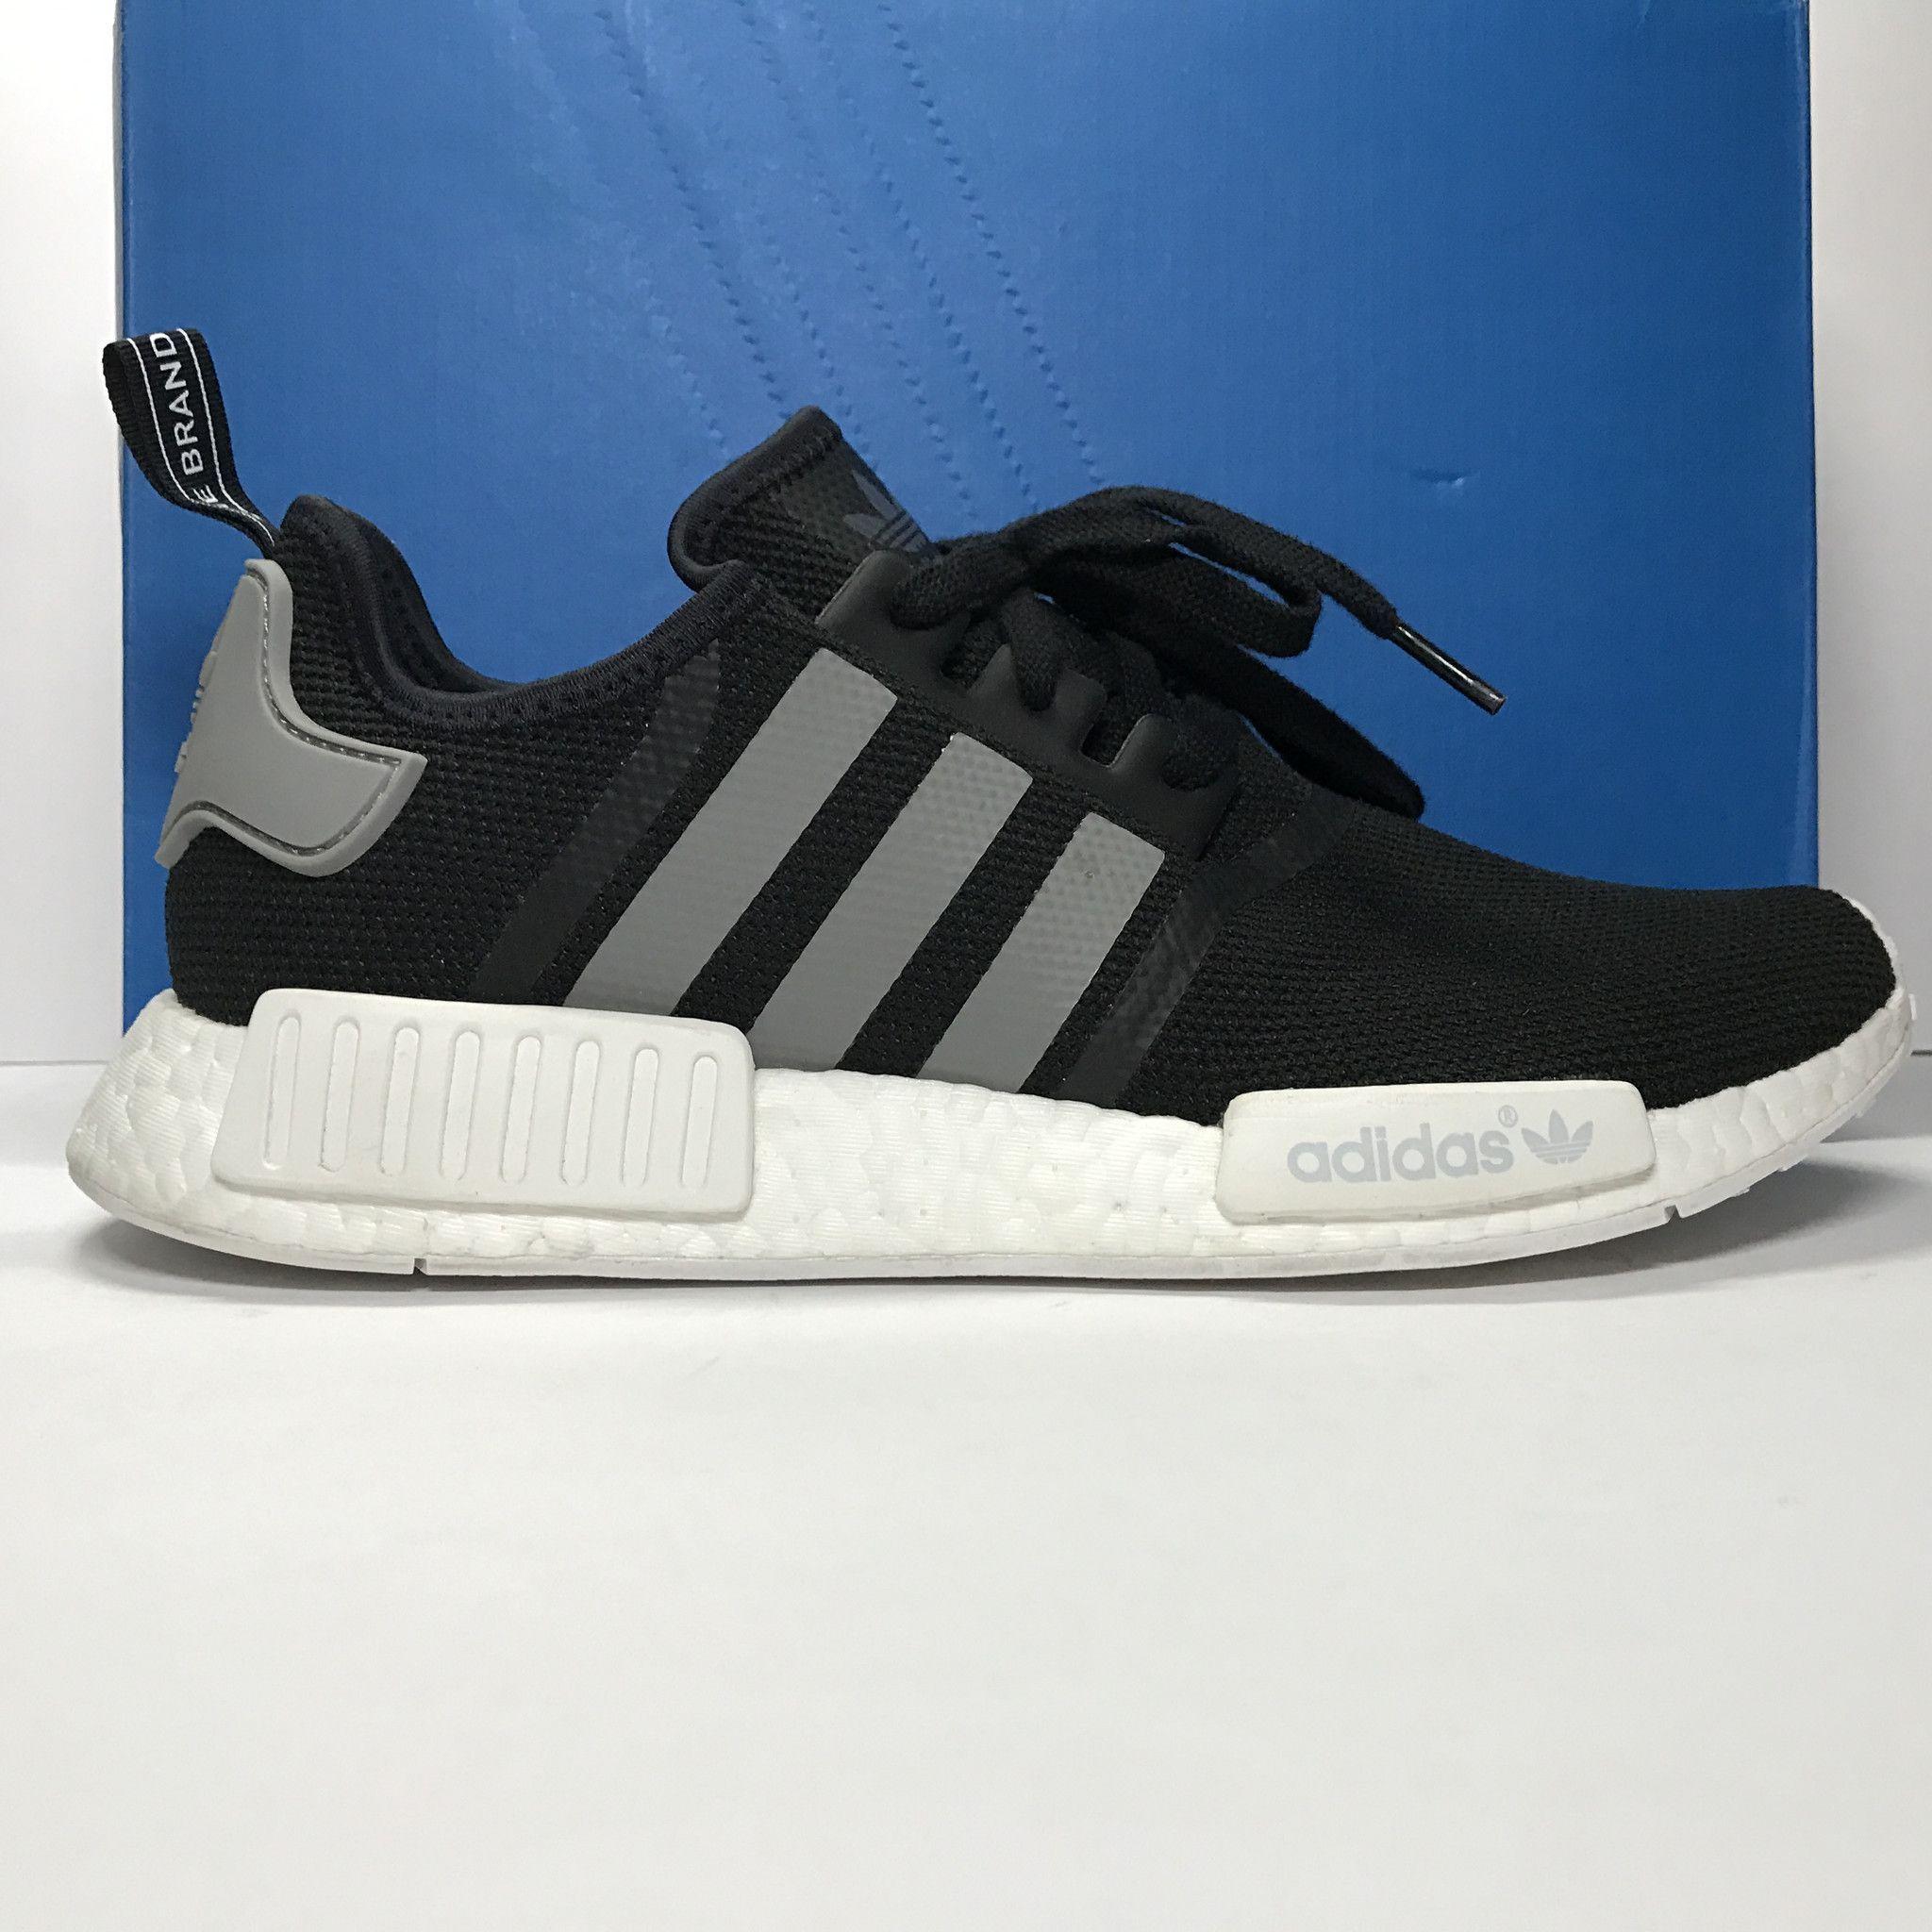 Adidas Originals NMD R1 Wool Dark Grey/Semi Solar Red S31510